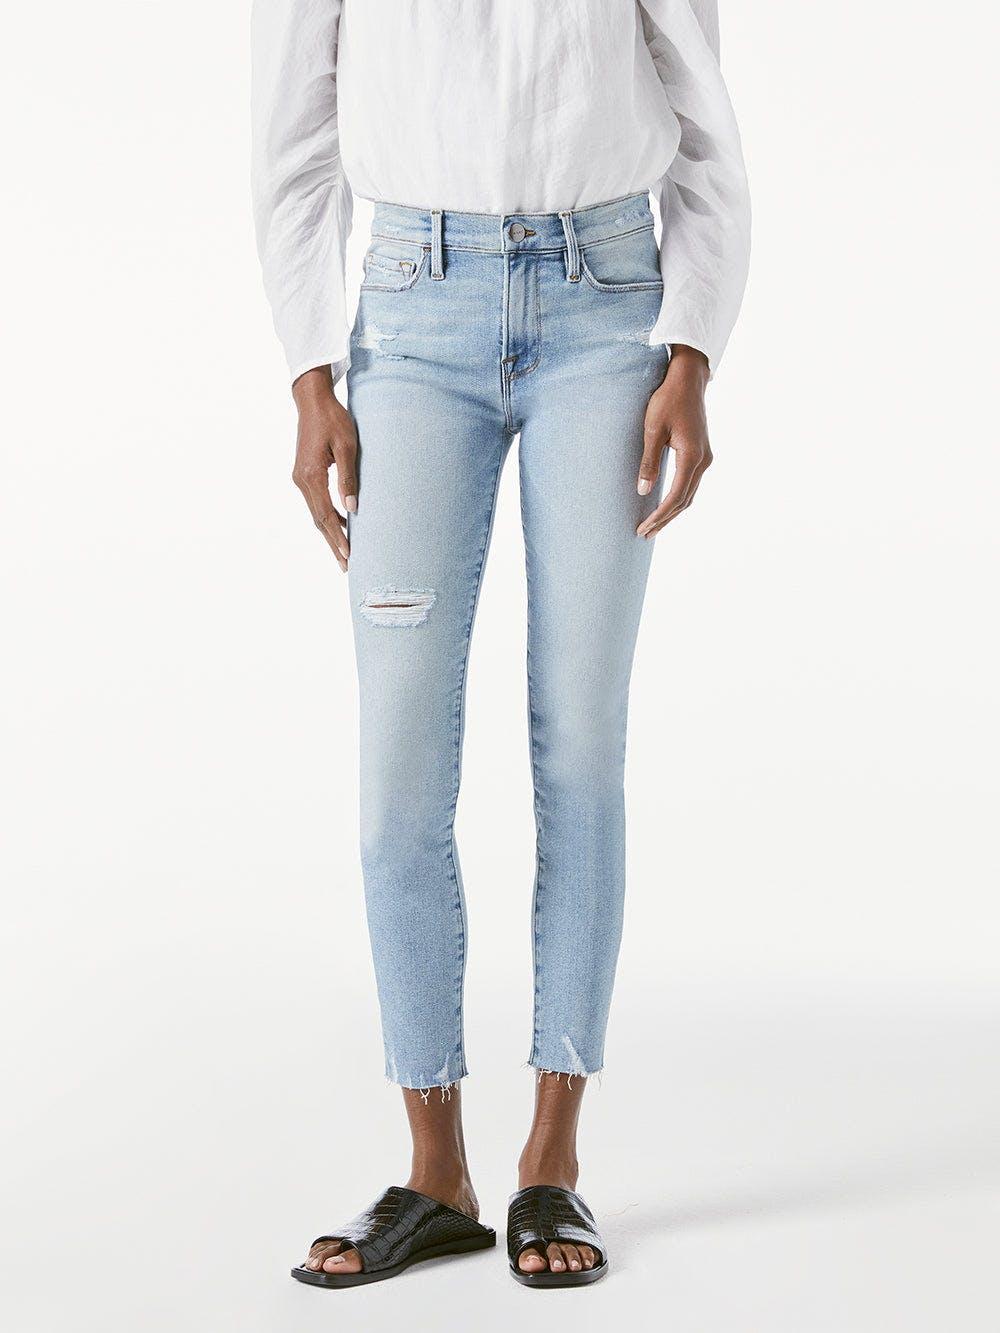 jeans front view alt:hover